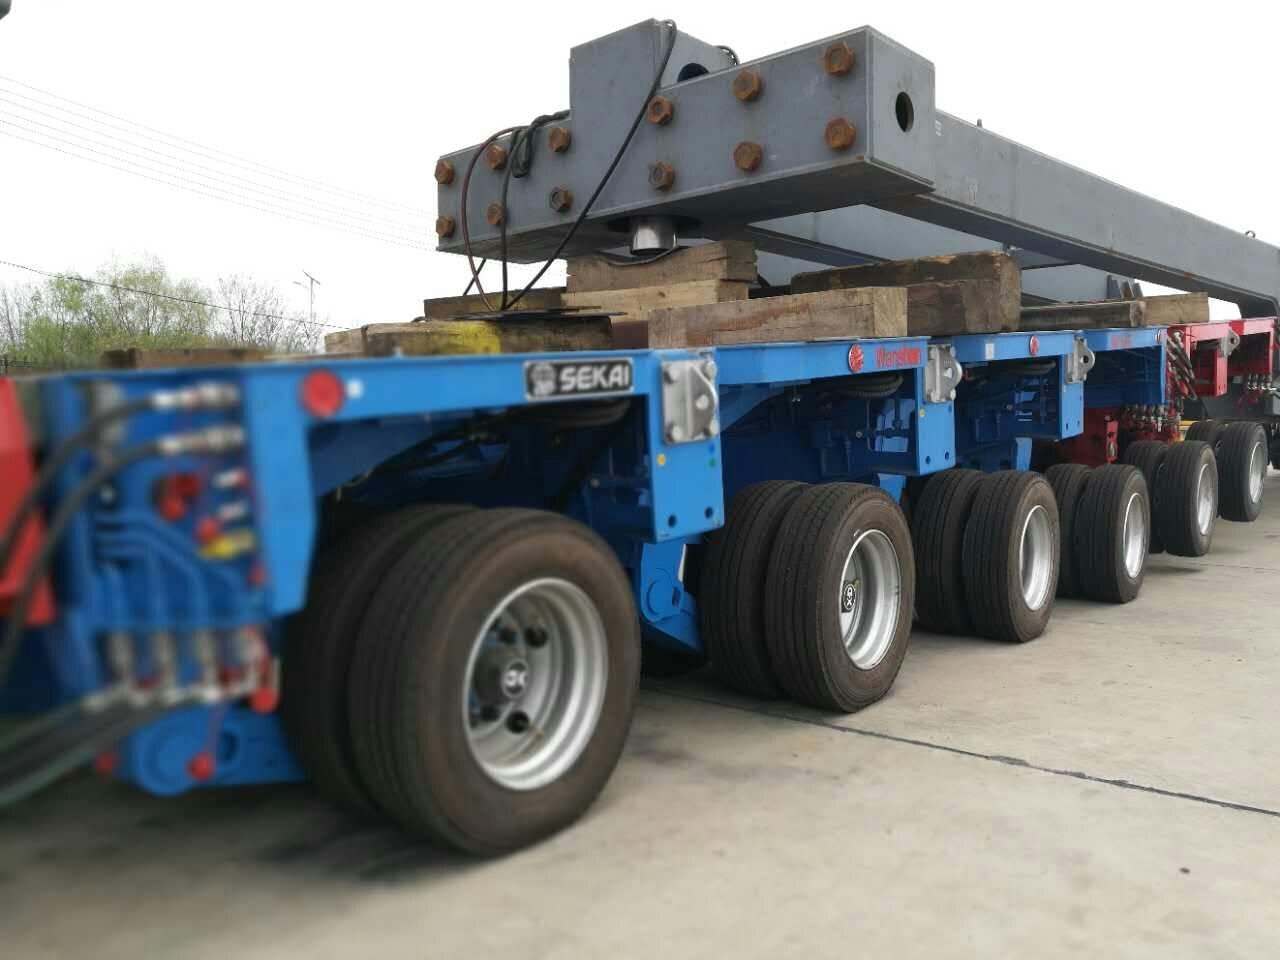 modular trailer for sekai